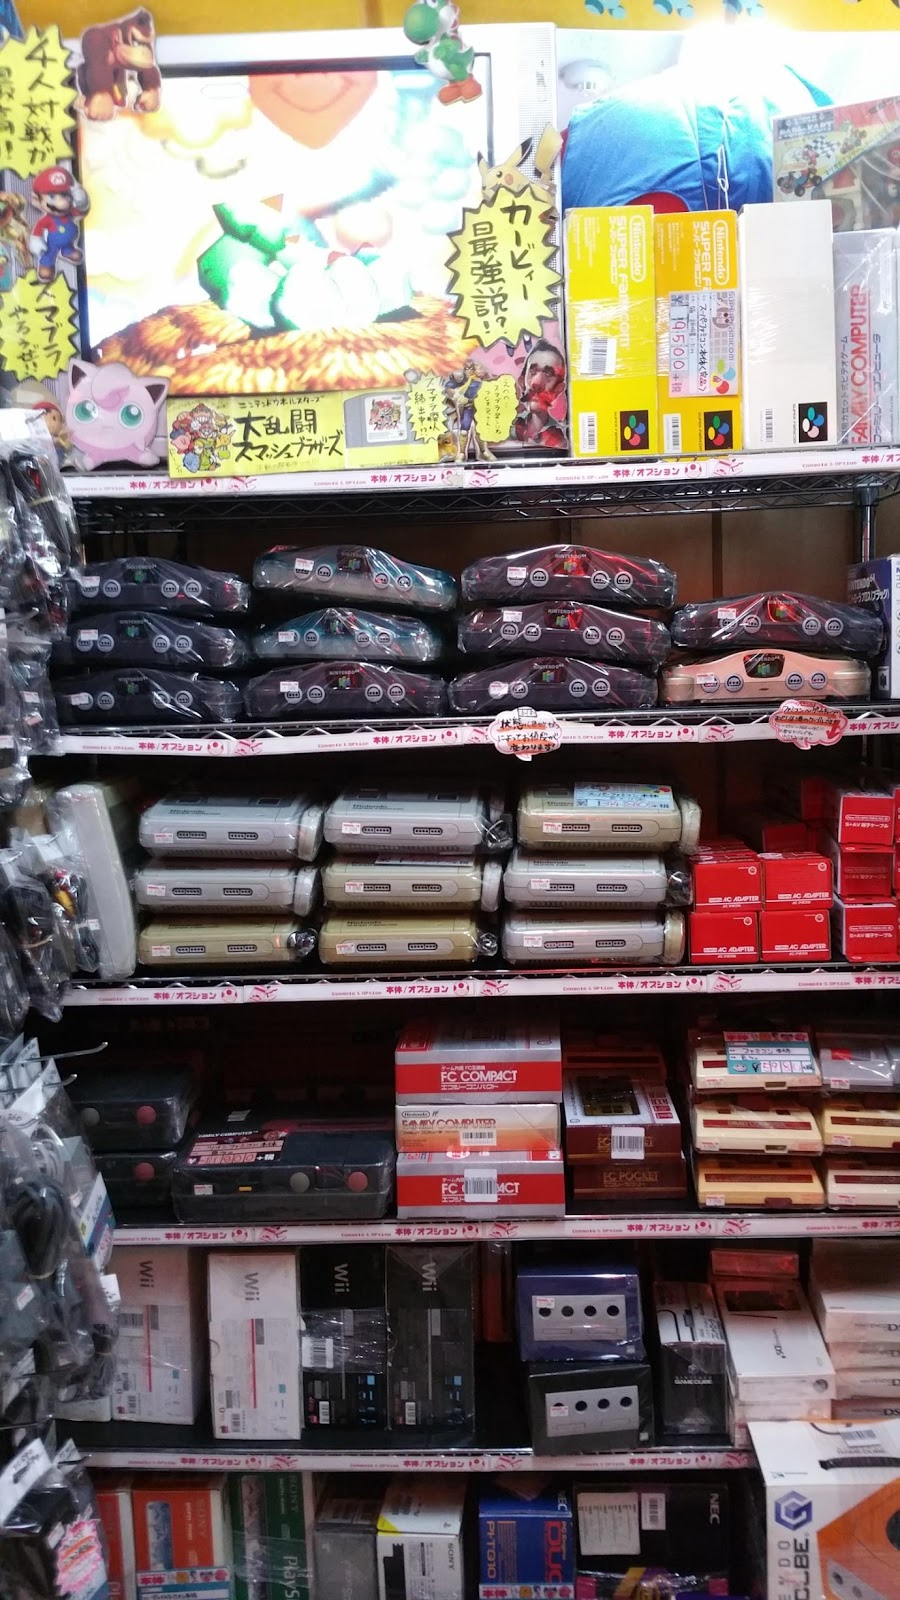 C:\Users\J\Pictures\TOKYO NOV 2016\SUPER POTATO\20161117_160223.jpg